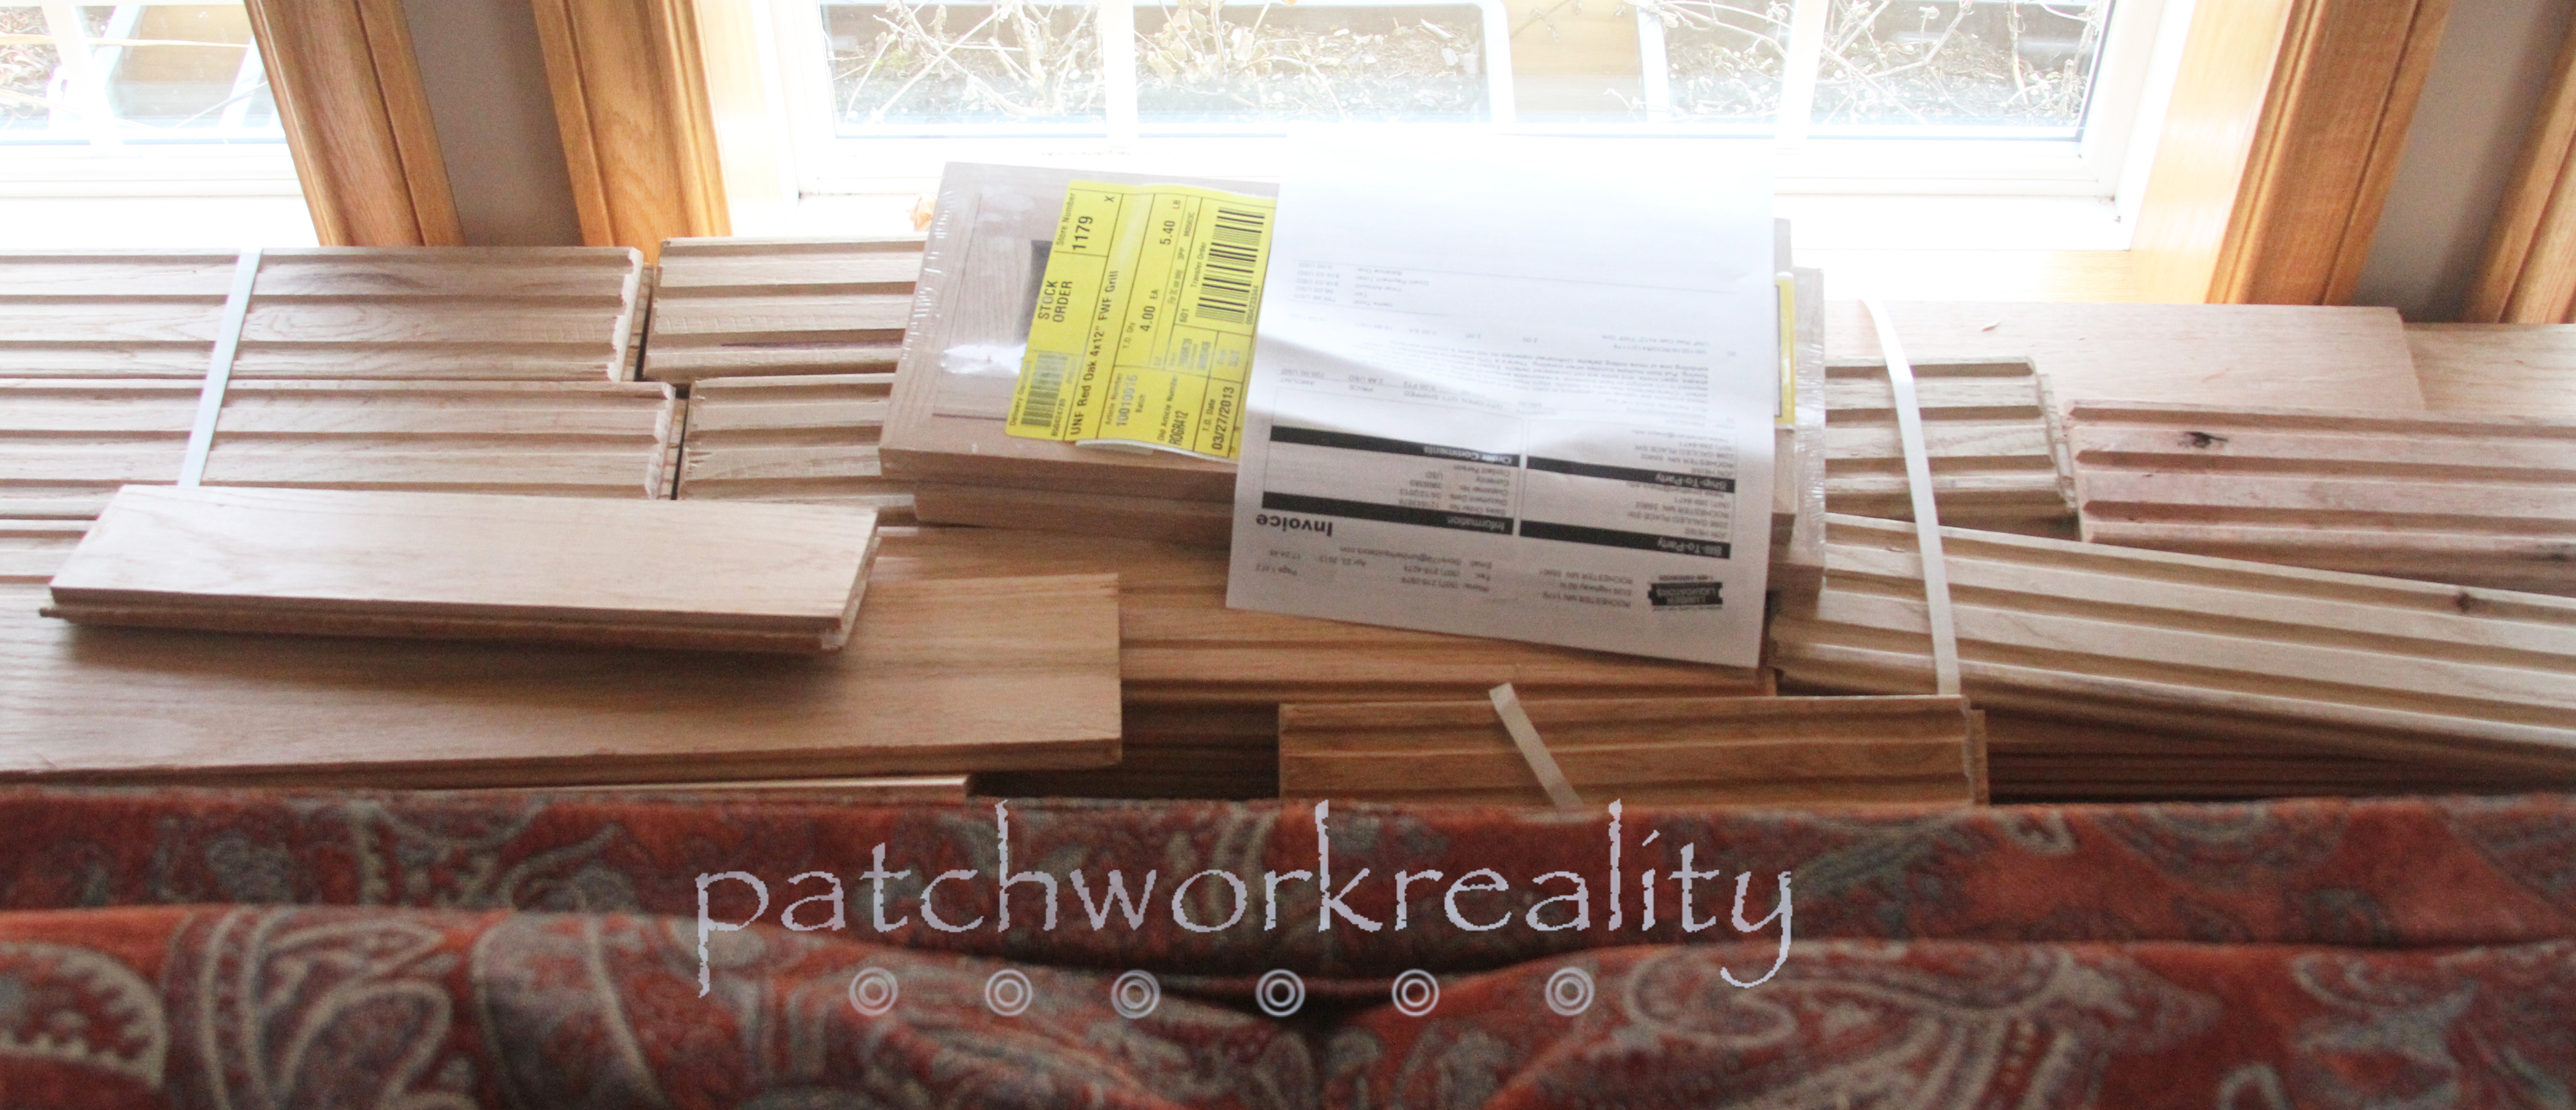 hardwood floor nail gun of oak floorng patchwork reality throughout ebay 930